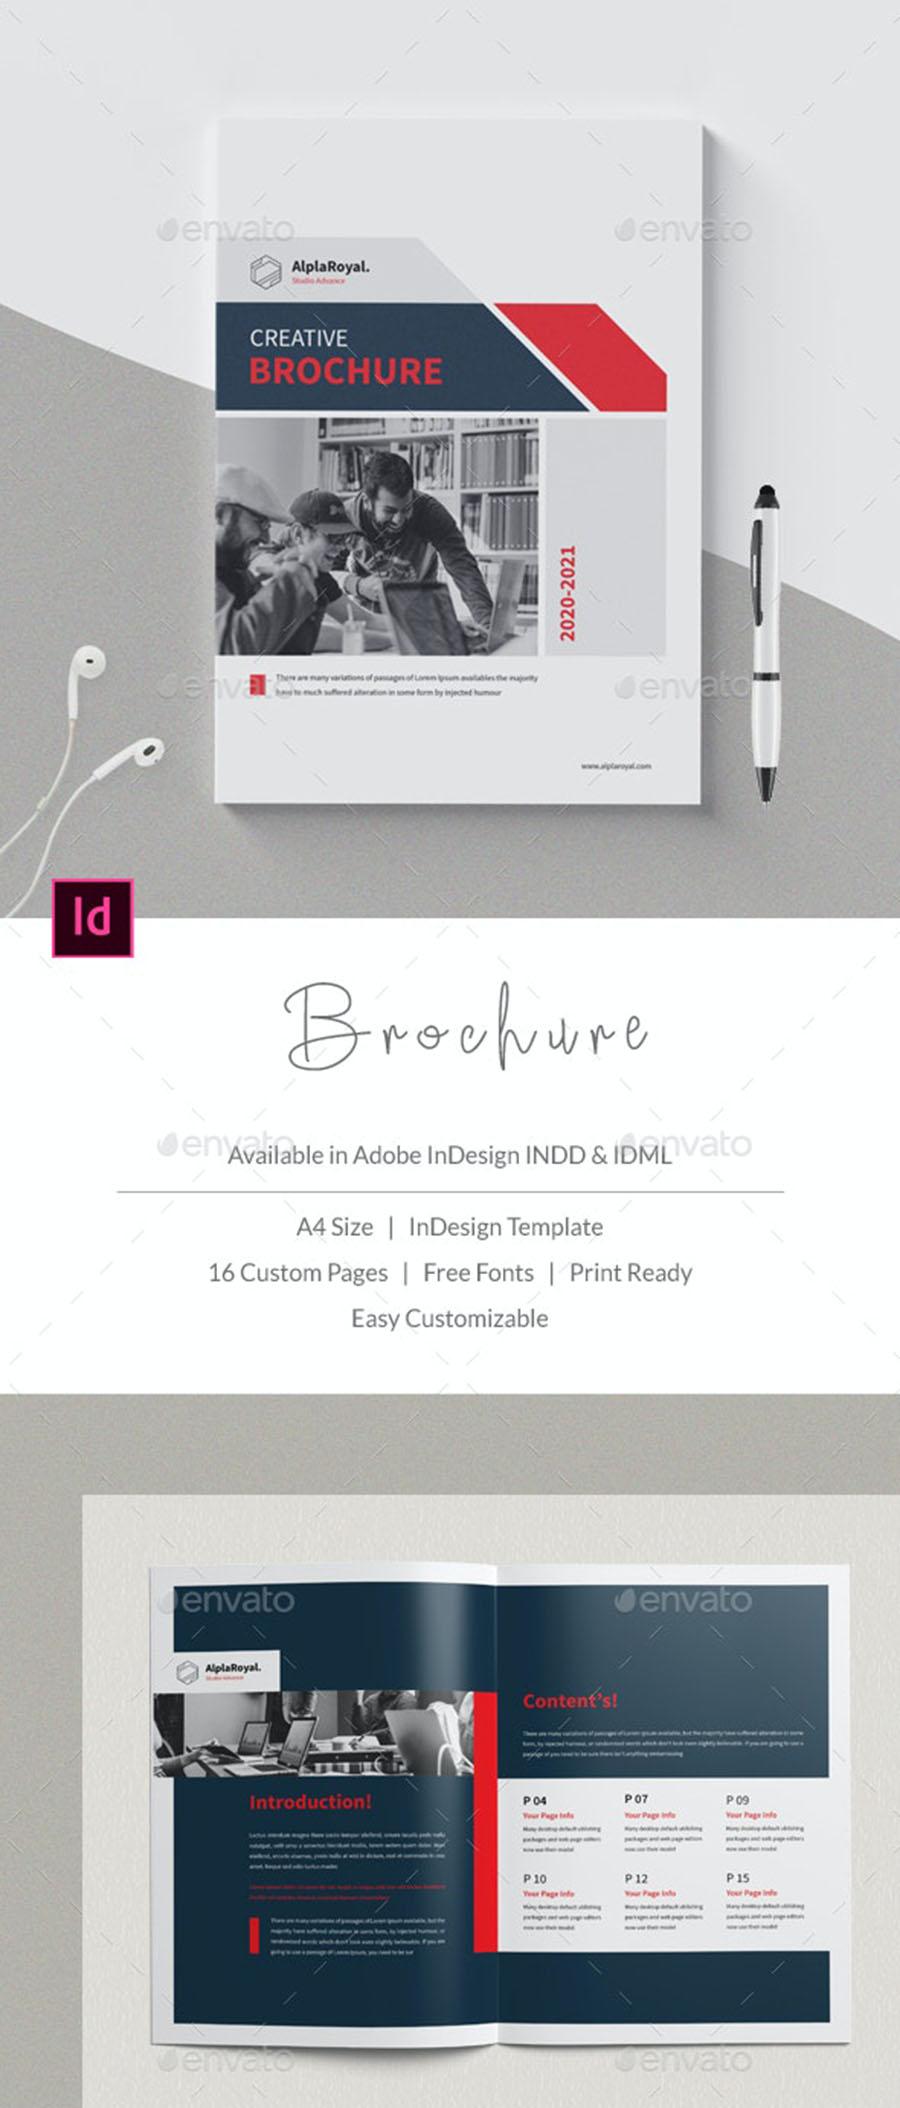 Modern Creative Brochure Template